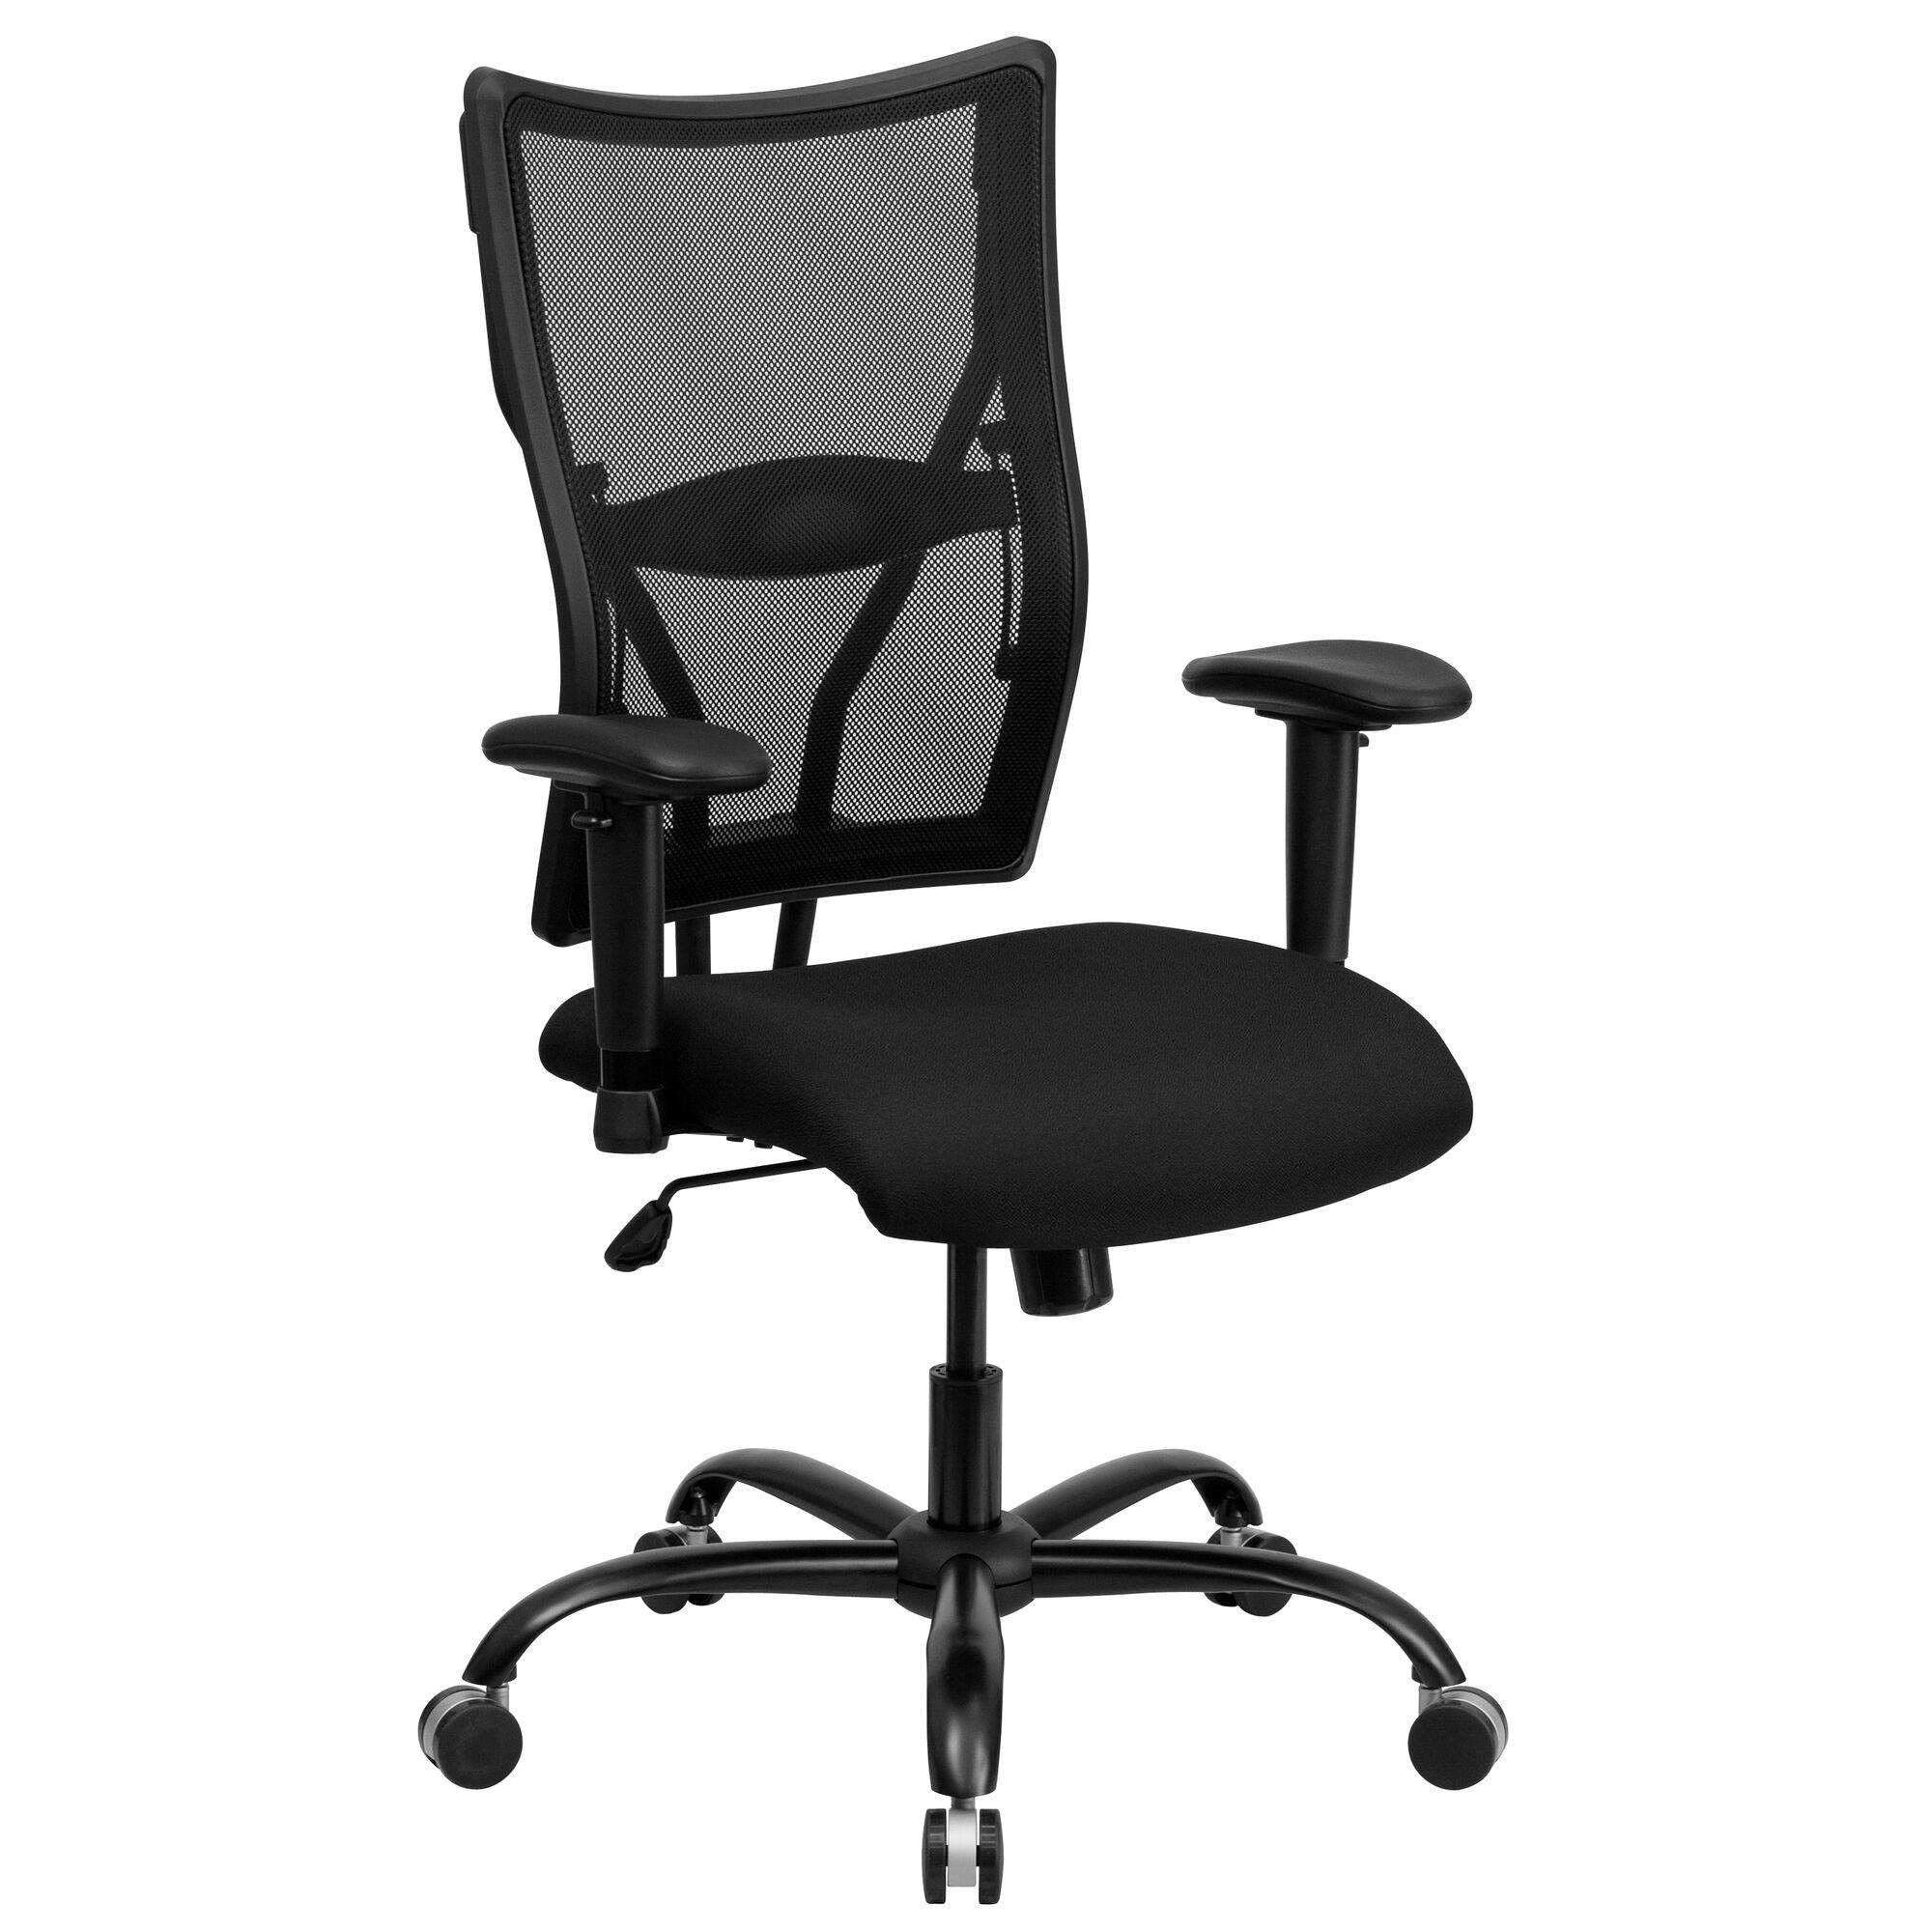 Pleasing Hercules Series Big Tall 400 Lb Rated Black Mesh Executive Swivel Ergonomic Office Chair With Adjustable Arms Inzonedesignstudio Interior Chair Design Inzonedesignstudiocom